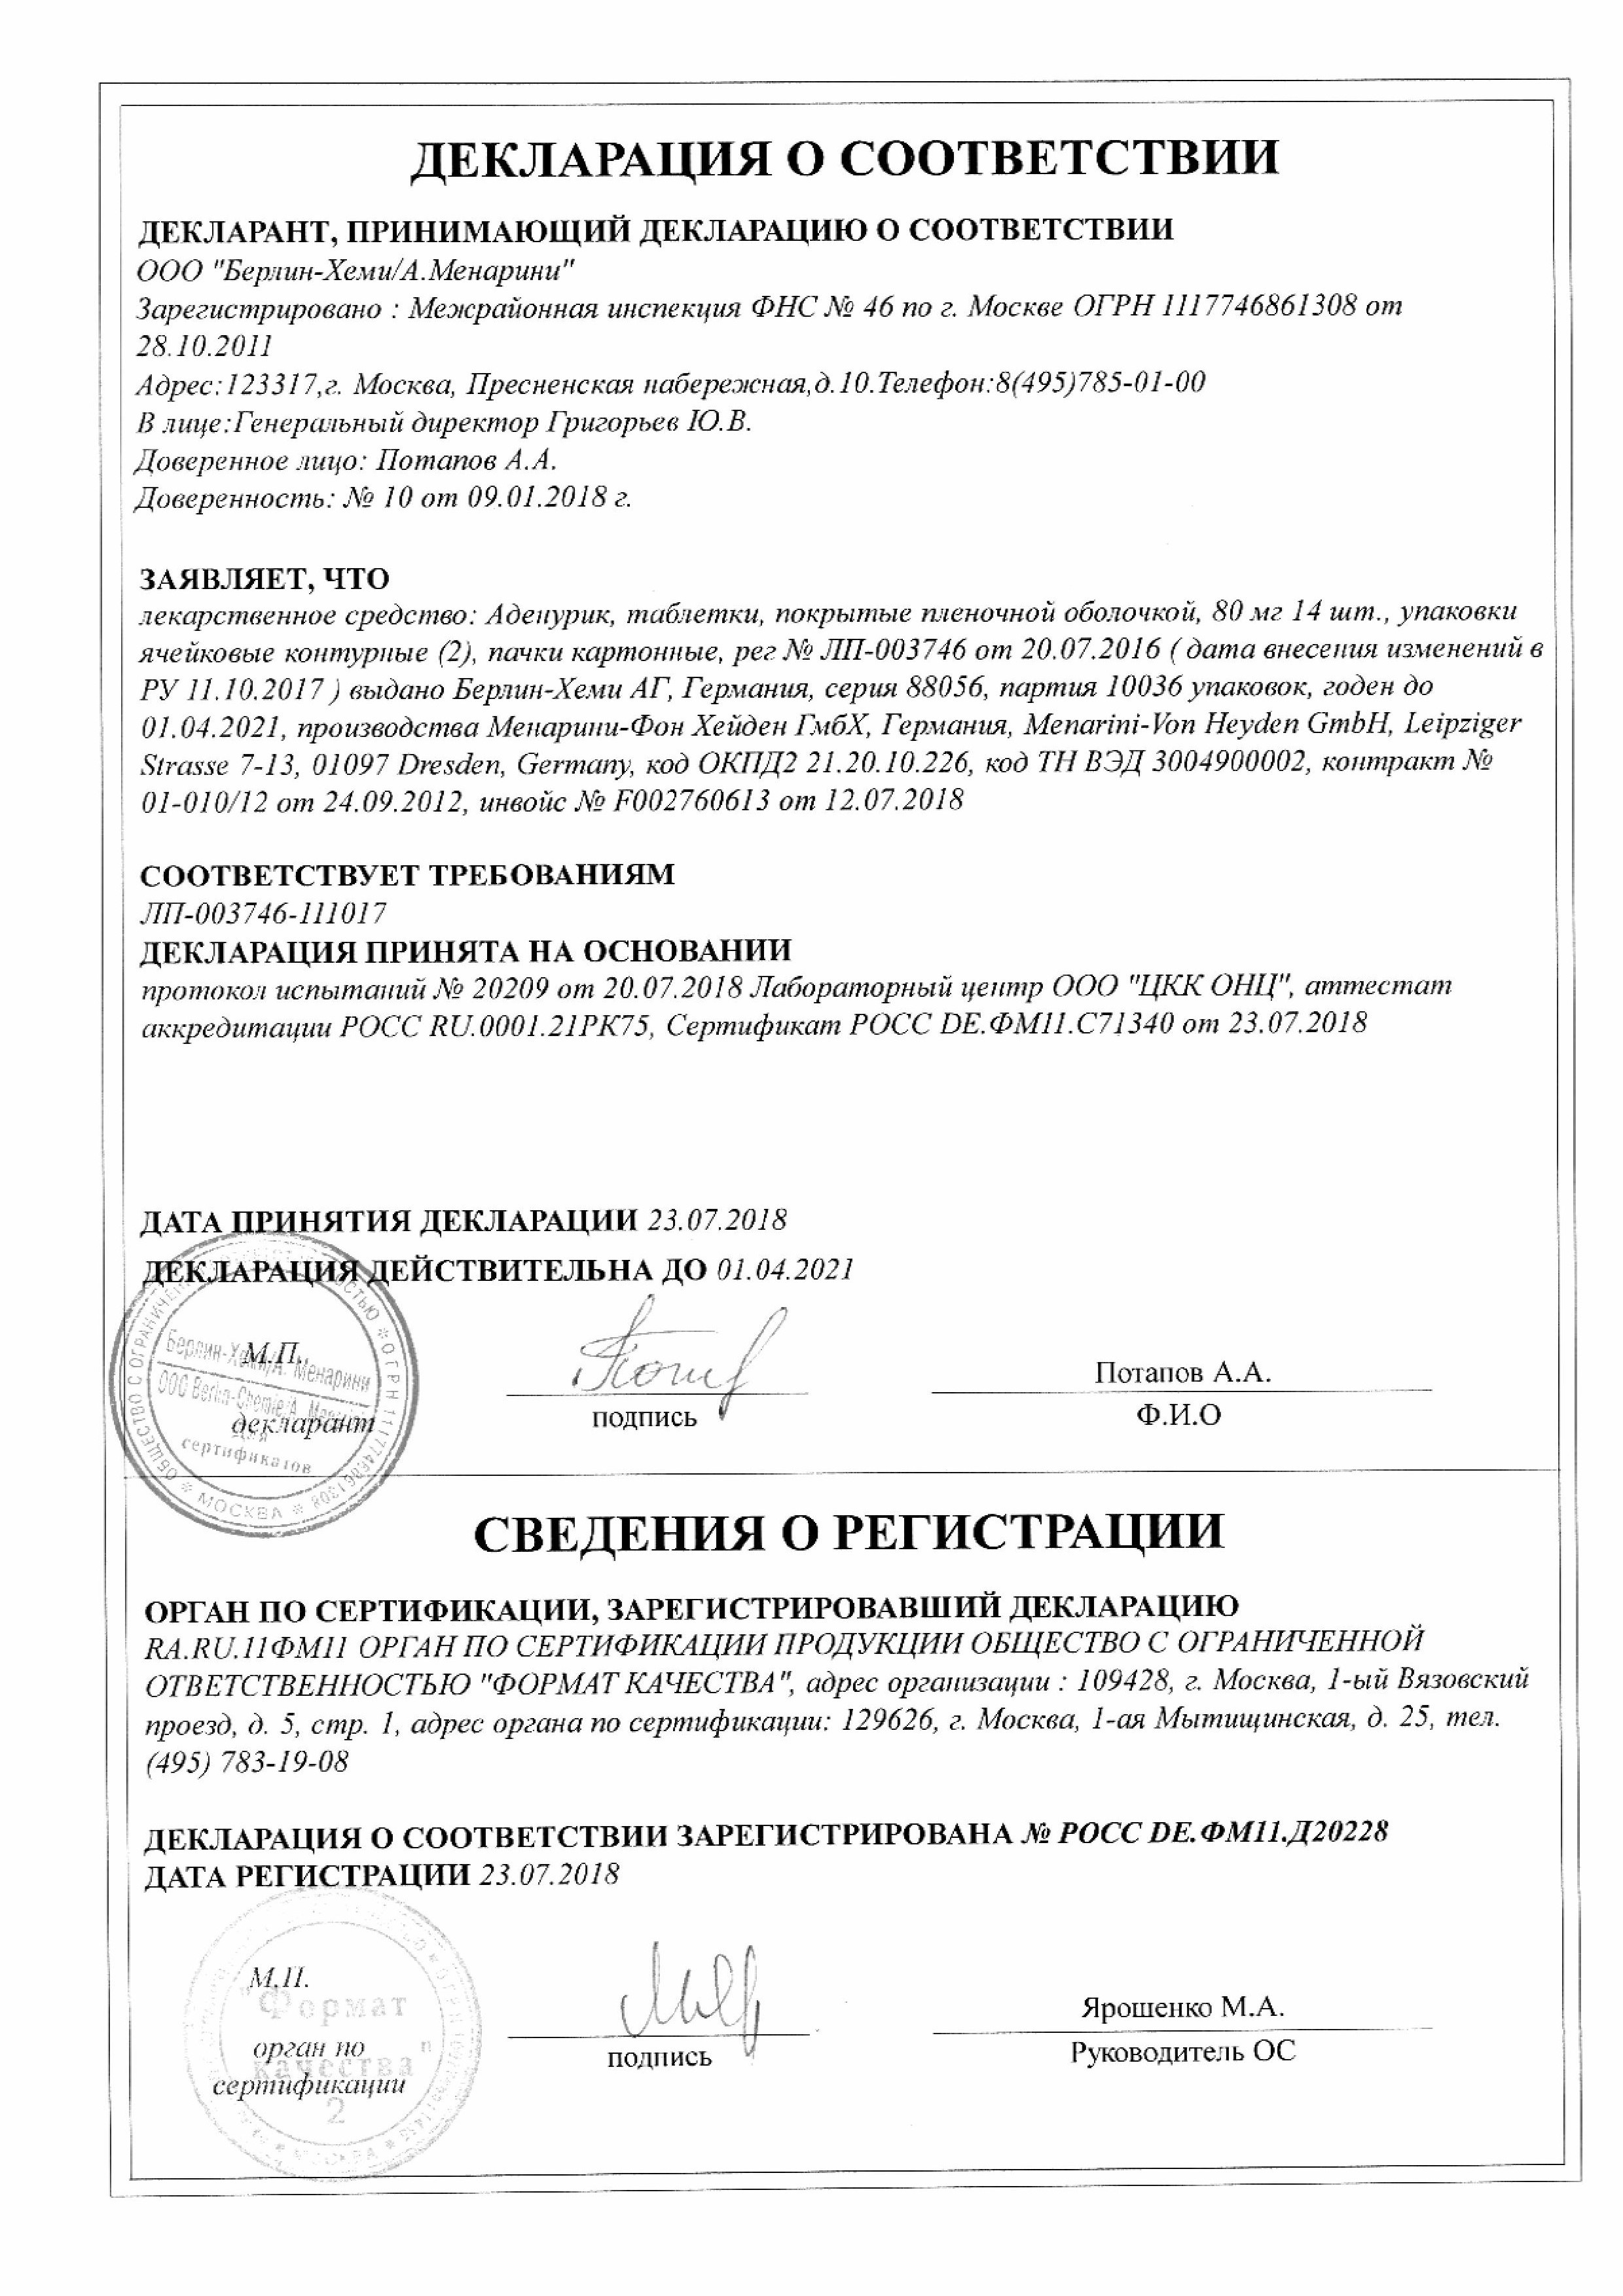 https://avisfarm.com/i/lek/certificates/7771230/69845-01305220.jpg?id=24